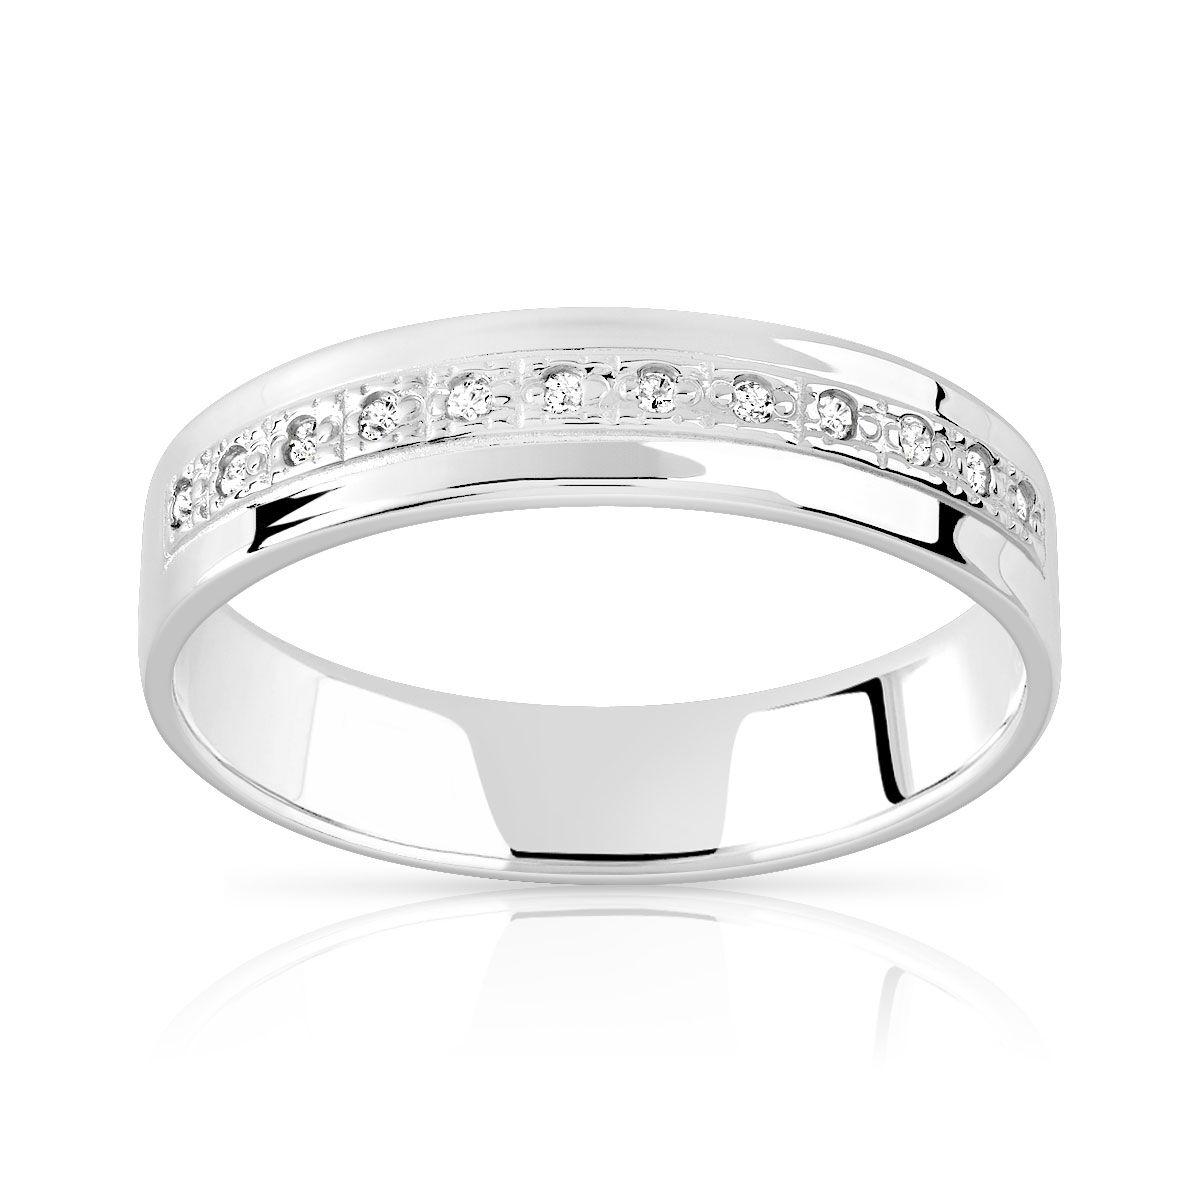 MATY Alliance argent diamants - 47-48,49-50,51-52,53-54,55-56,57-58,59-60